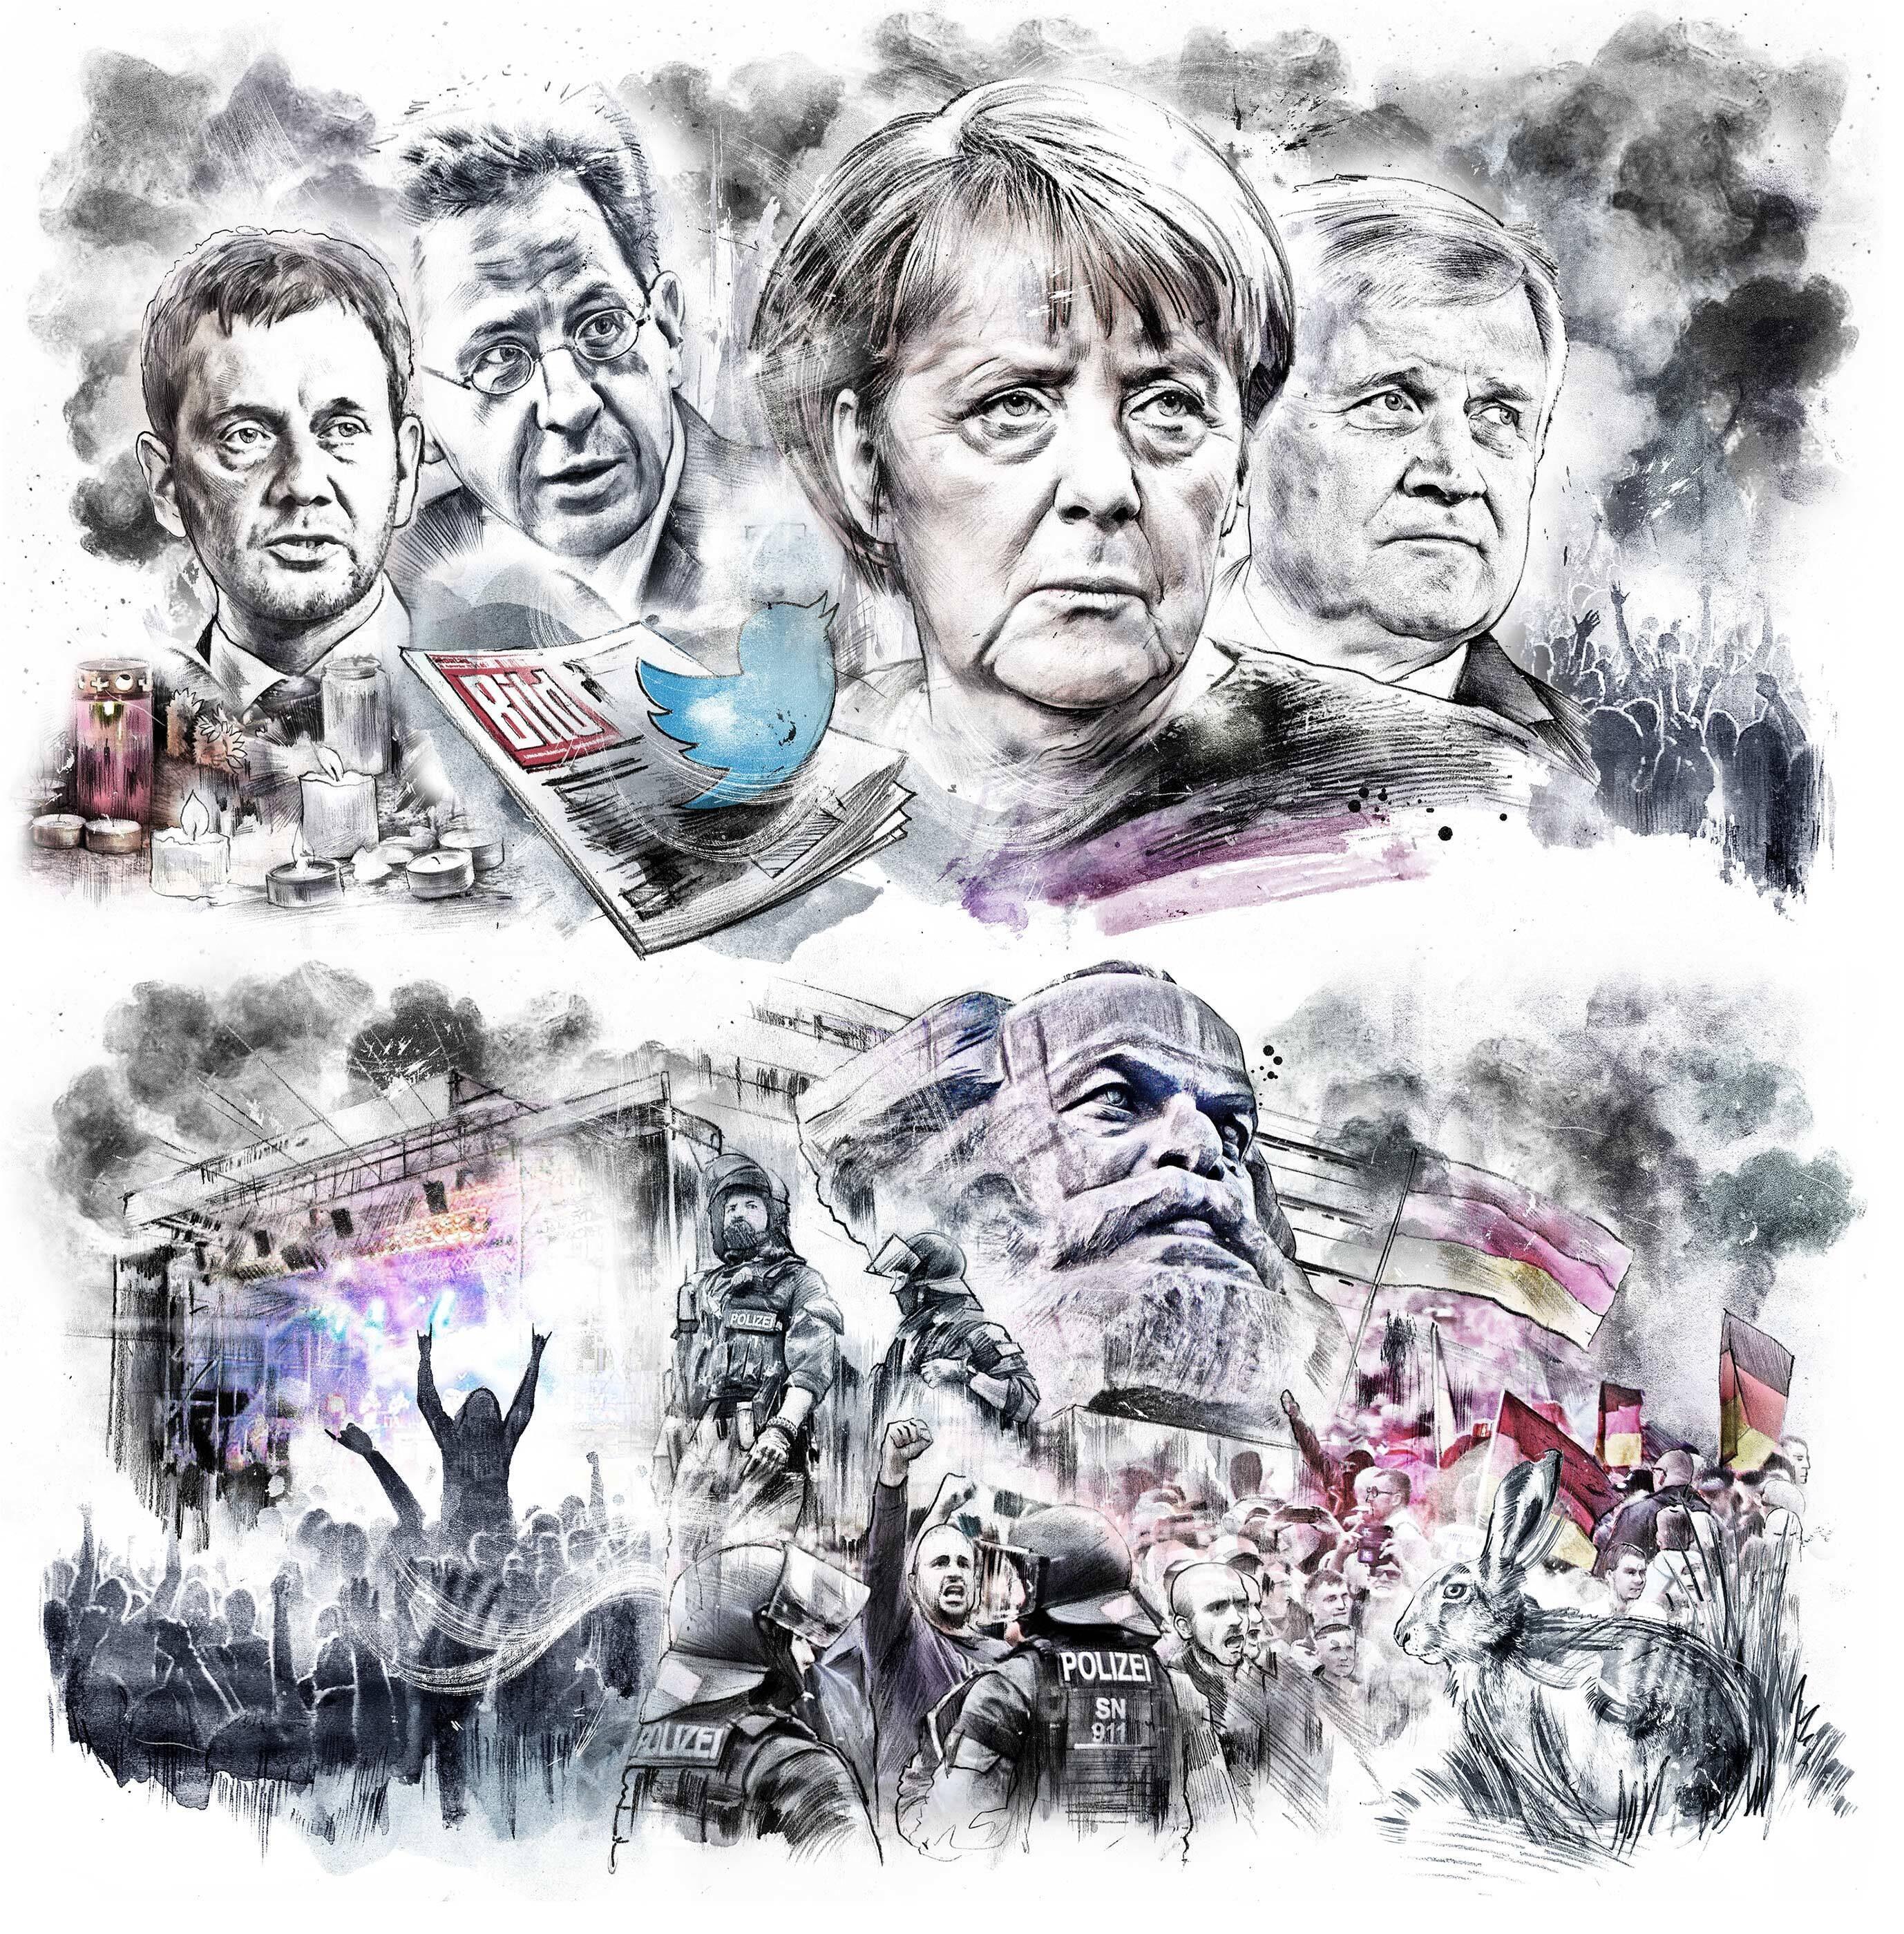 Editorial Illustration die Zeit Chemnitz - Kornel Illustration | Kornel Stadler portfolio